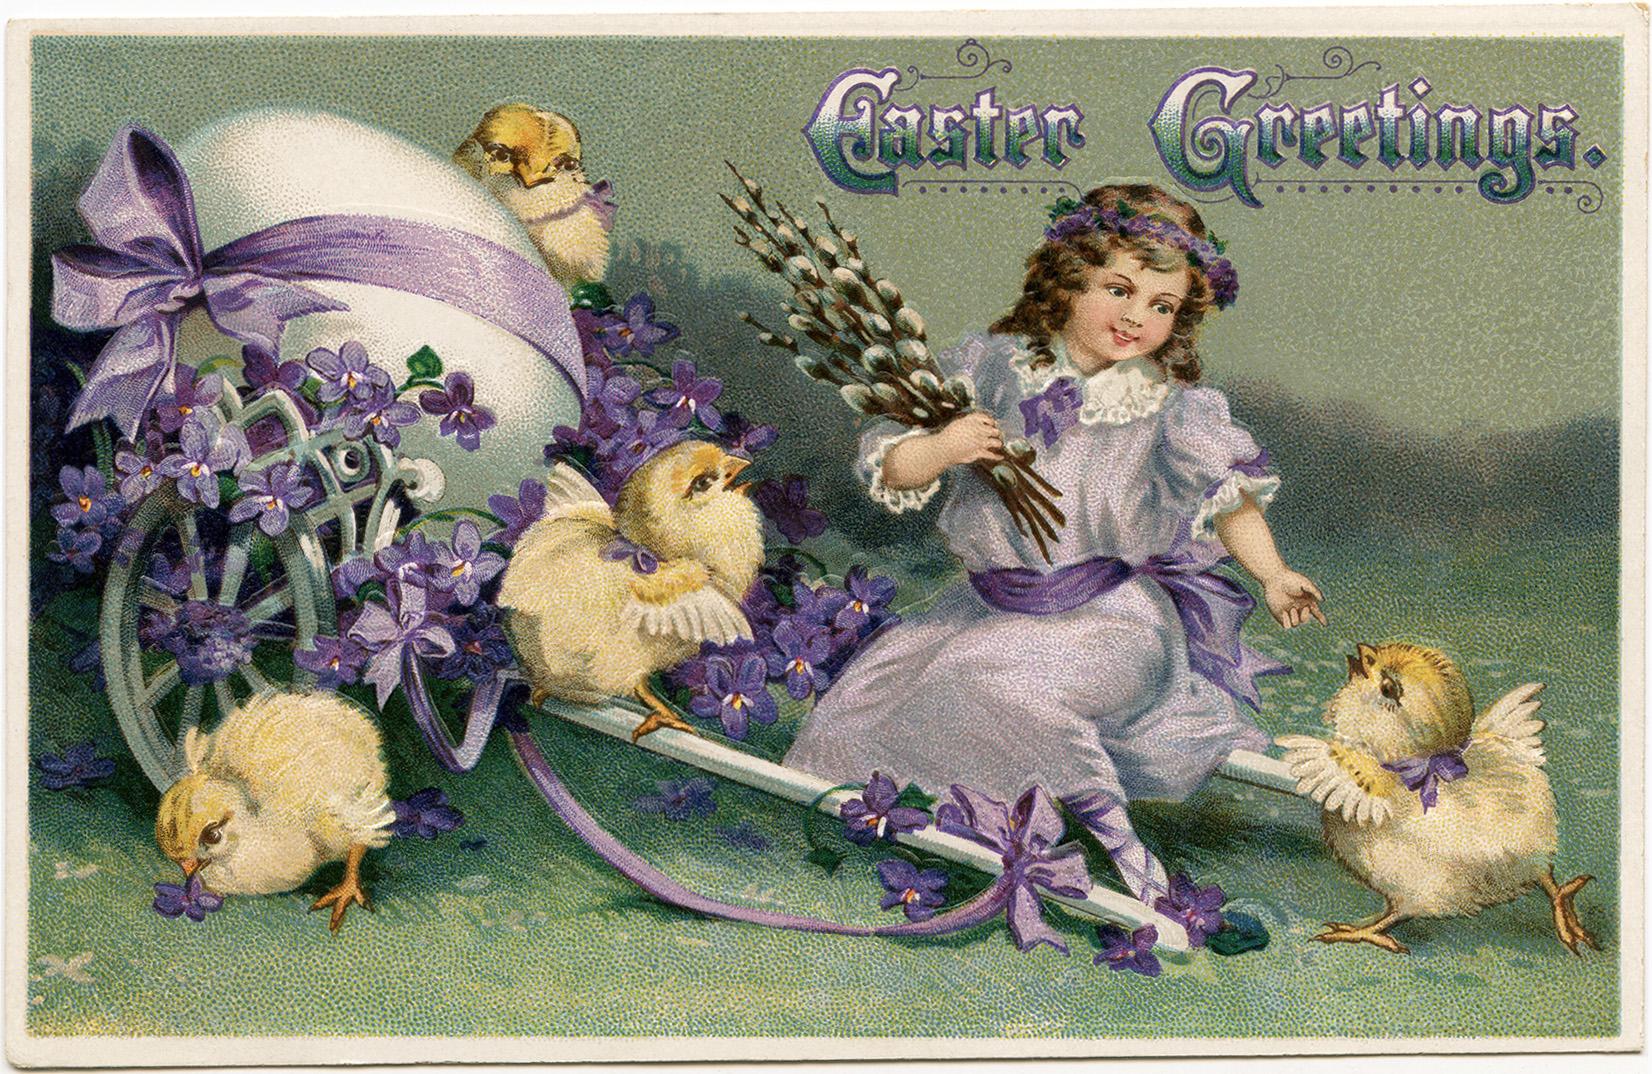 easter greetings printable postcard